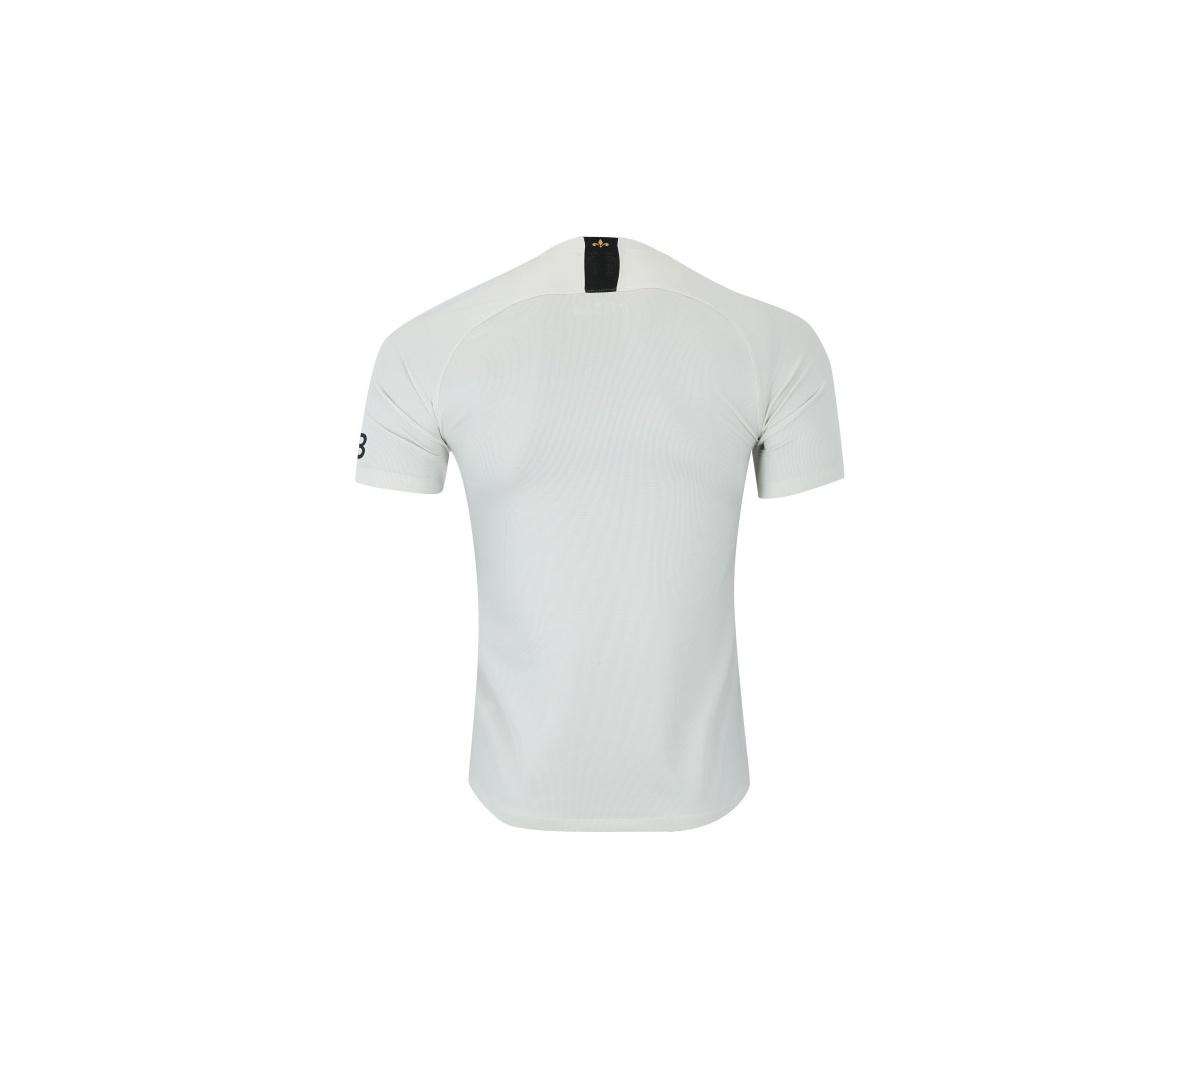 Camisa Nike Adulta Paris Saint Germaint II 2018/19.